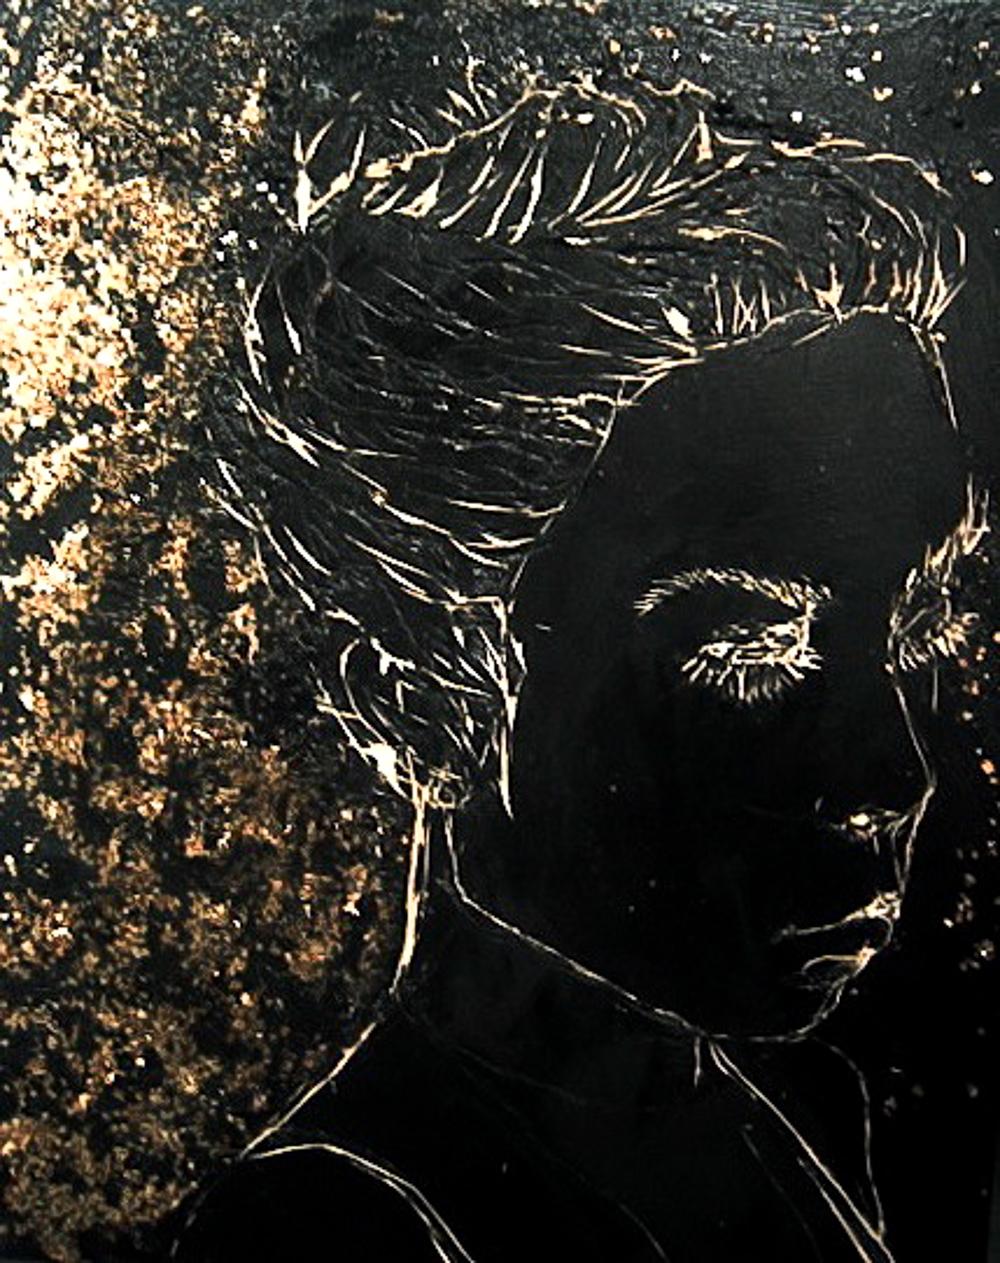 Self, Gold & black, 2007